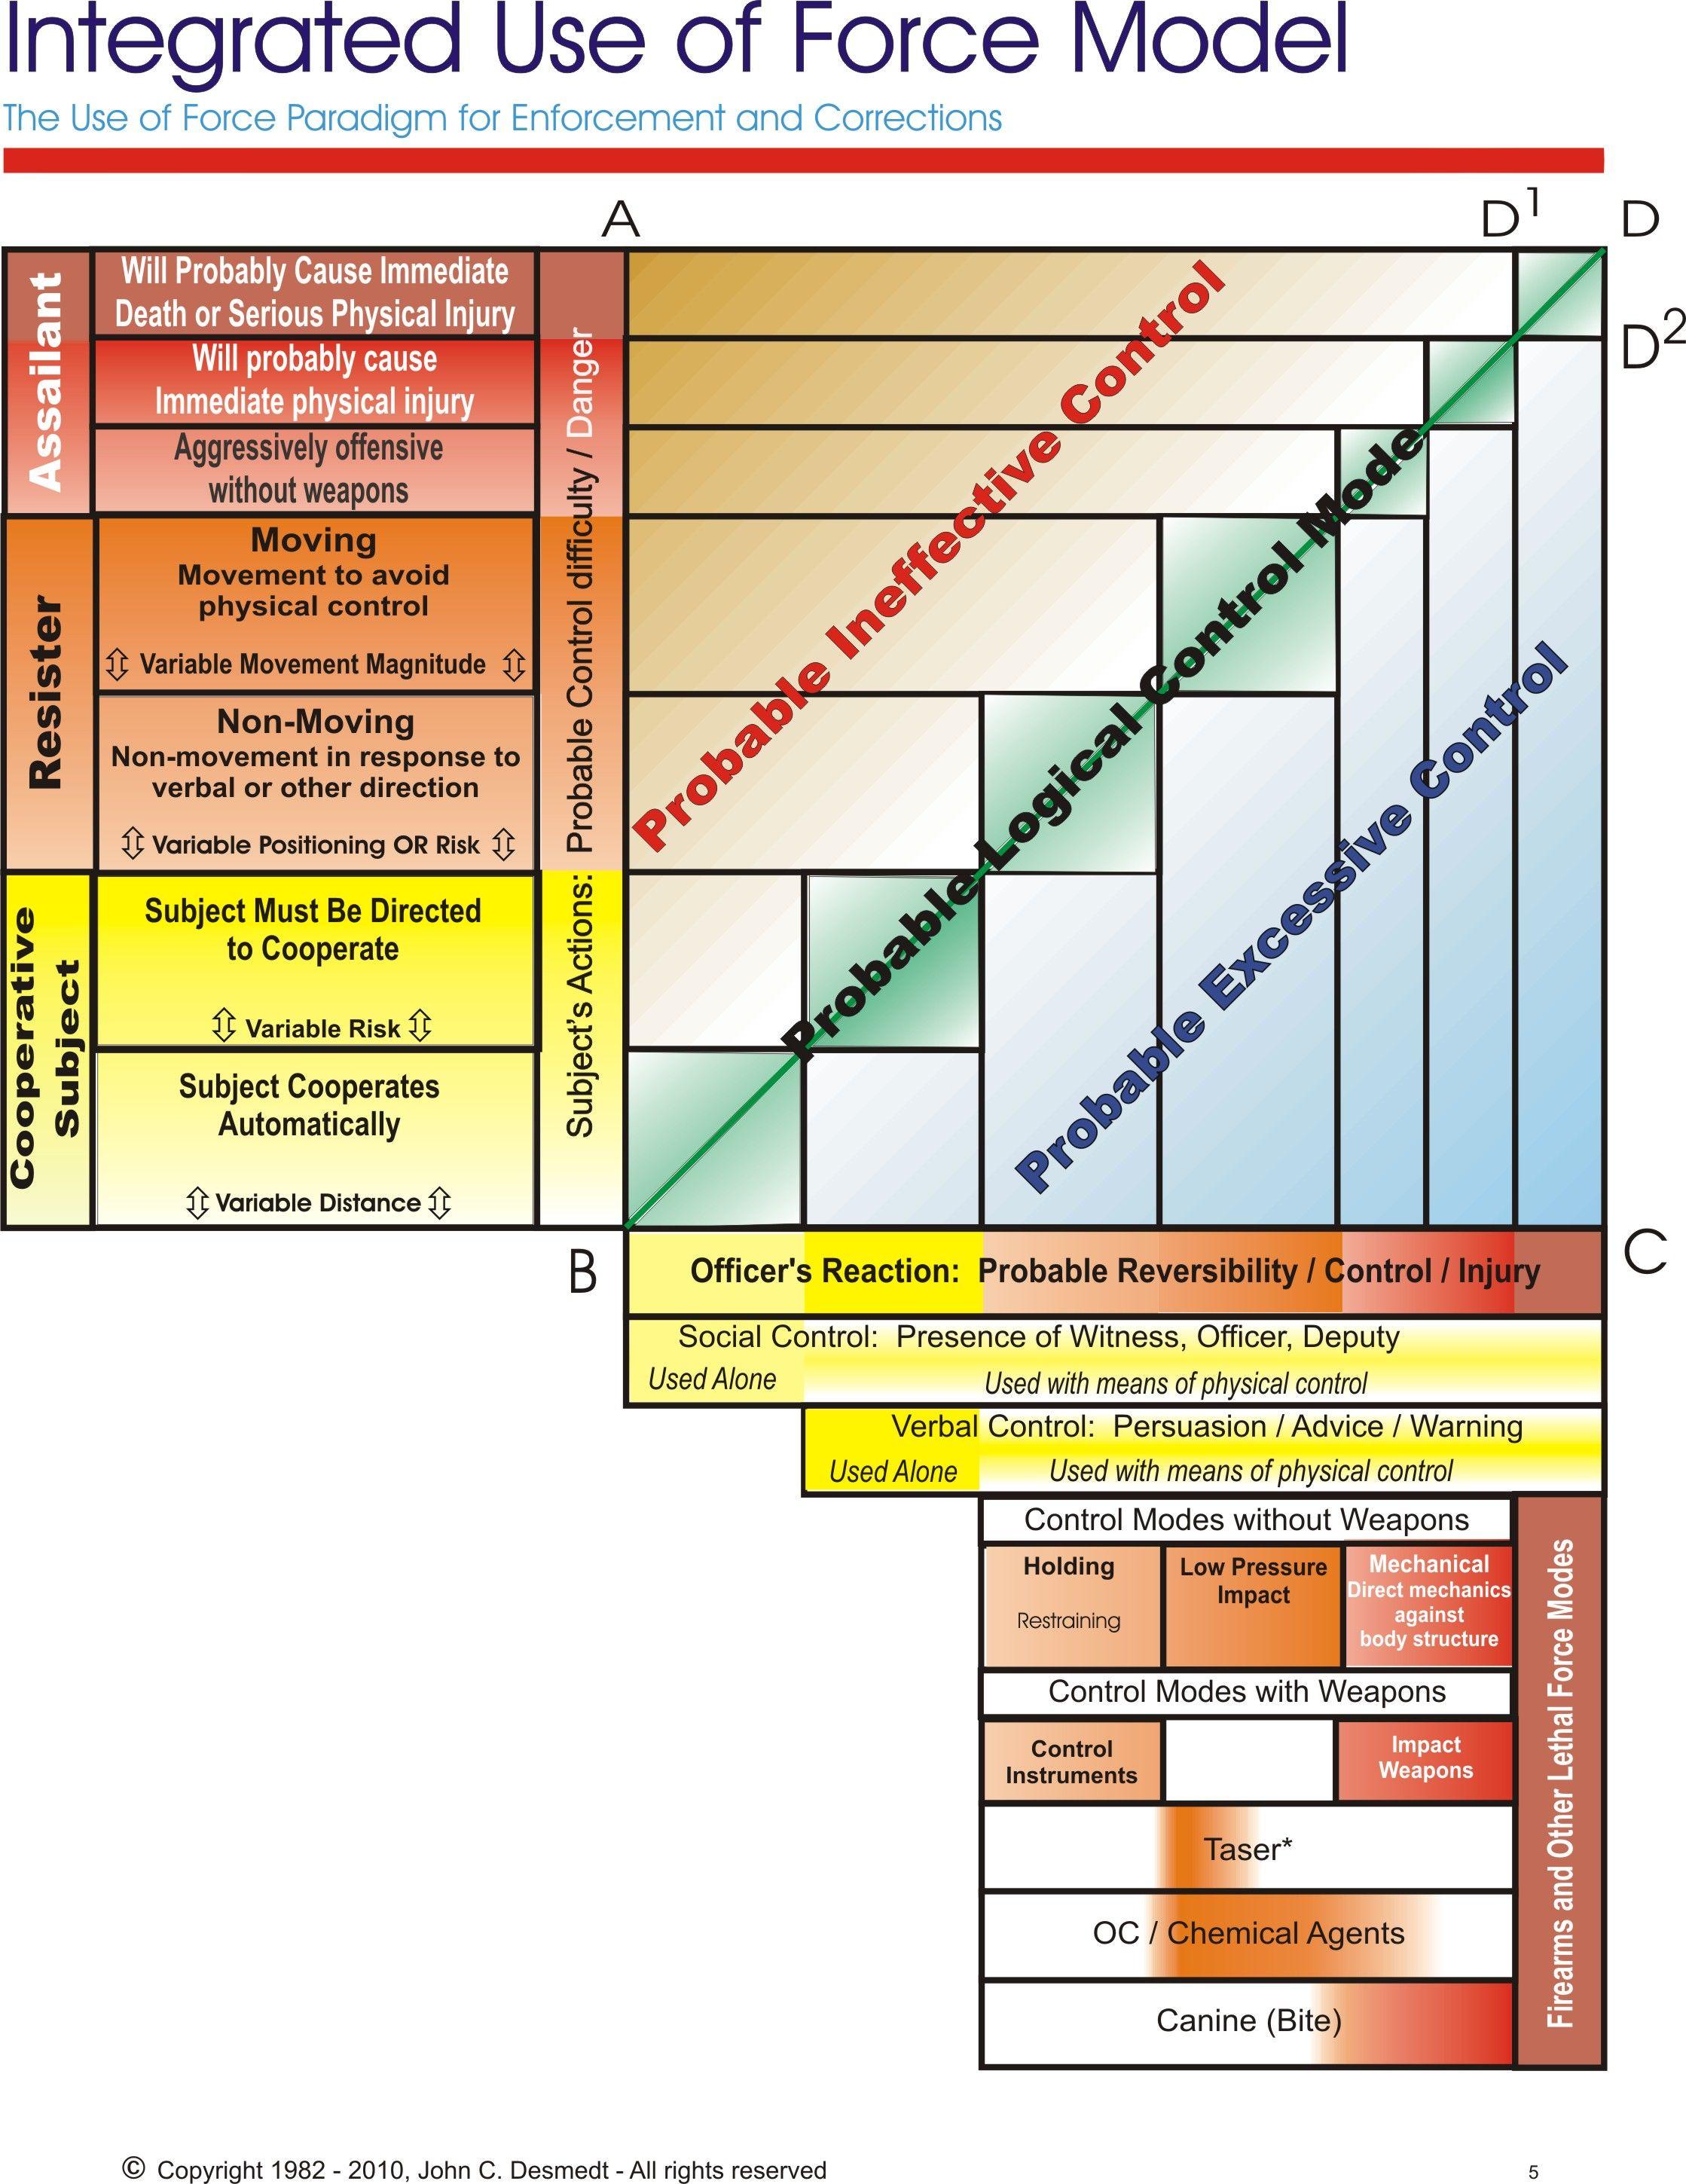 Escalation Diagram